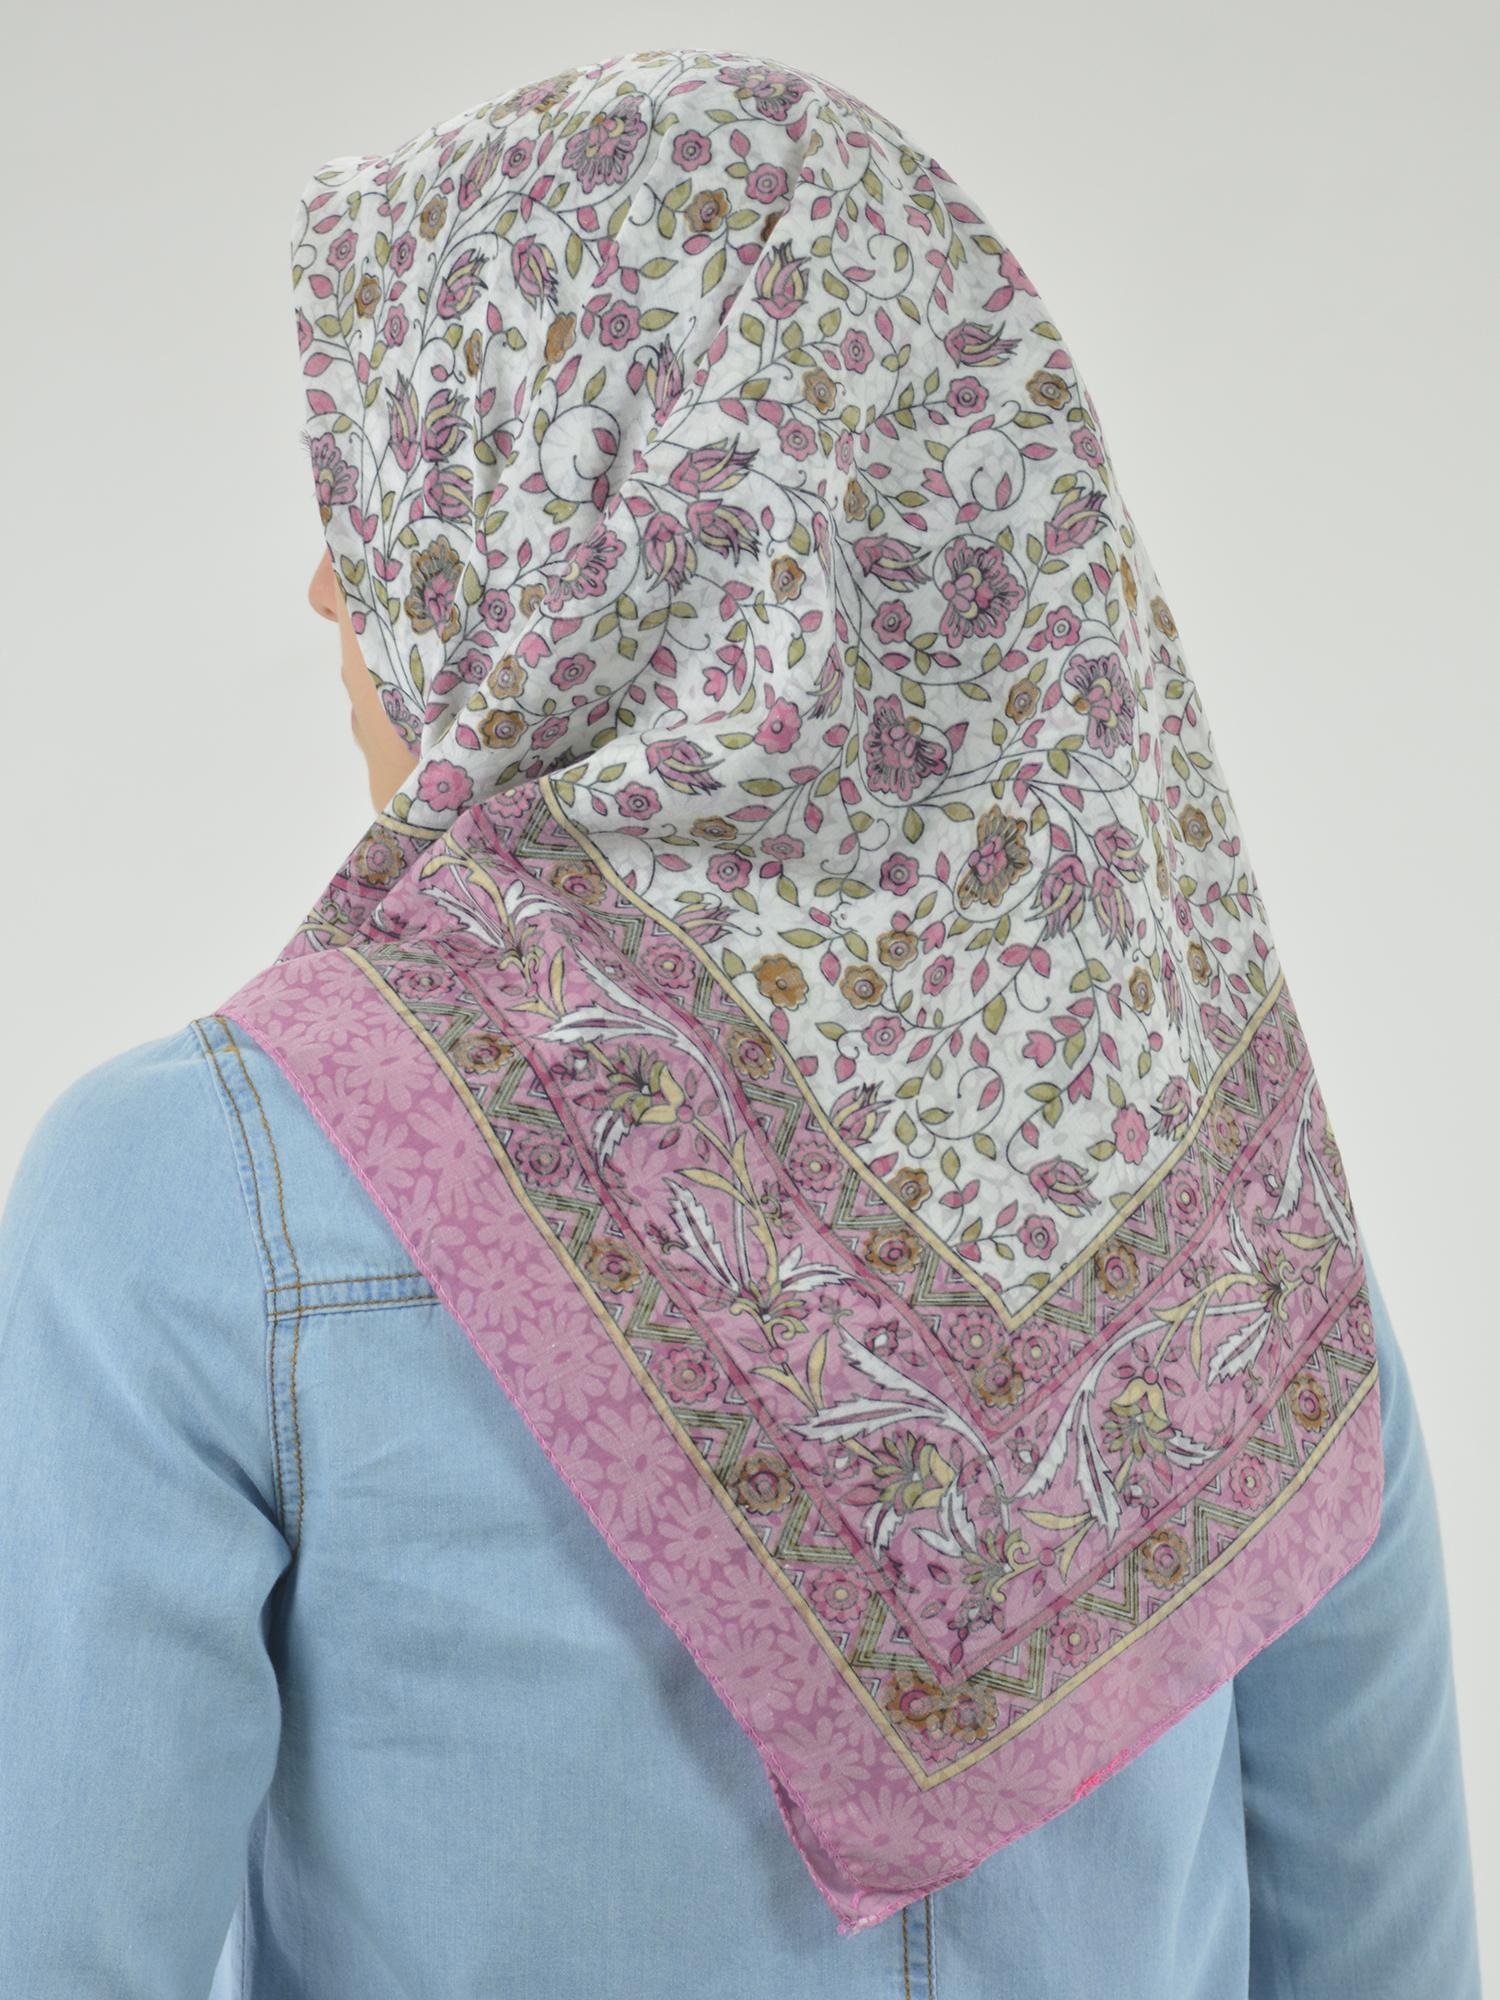 Blooming Vines Print Square Hijab HI2128 (2)